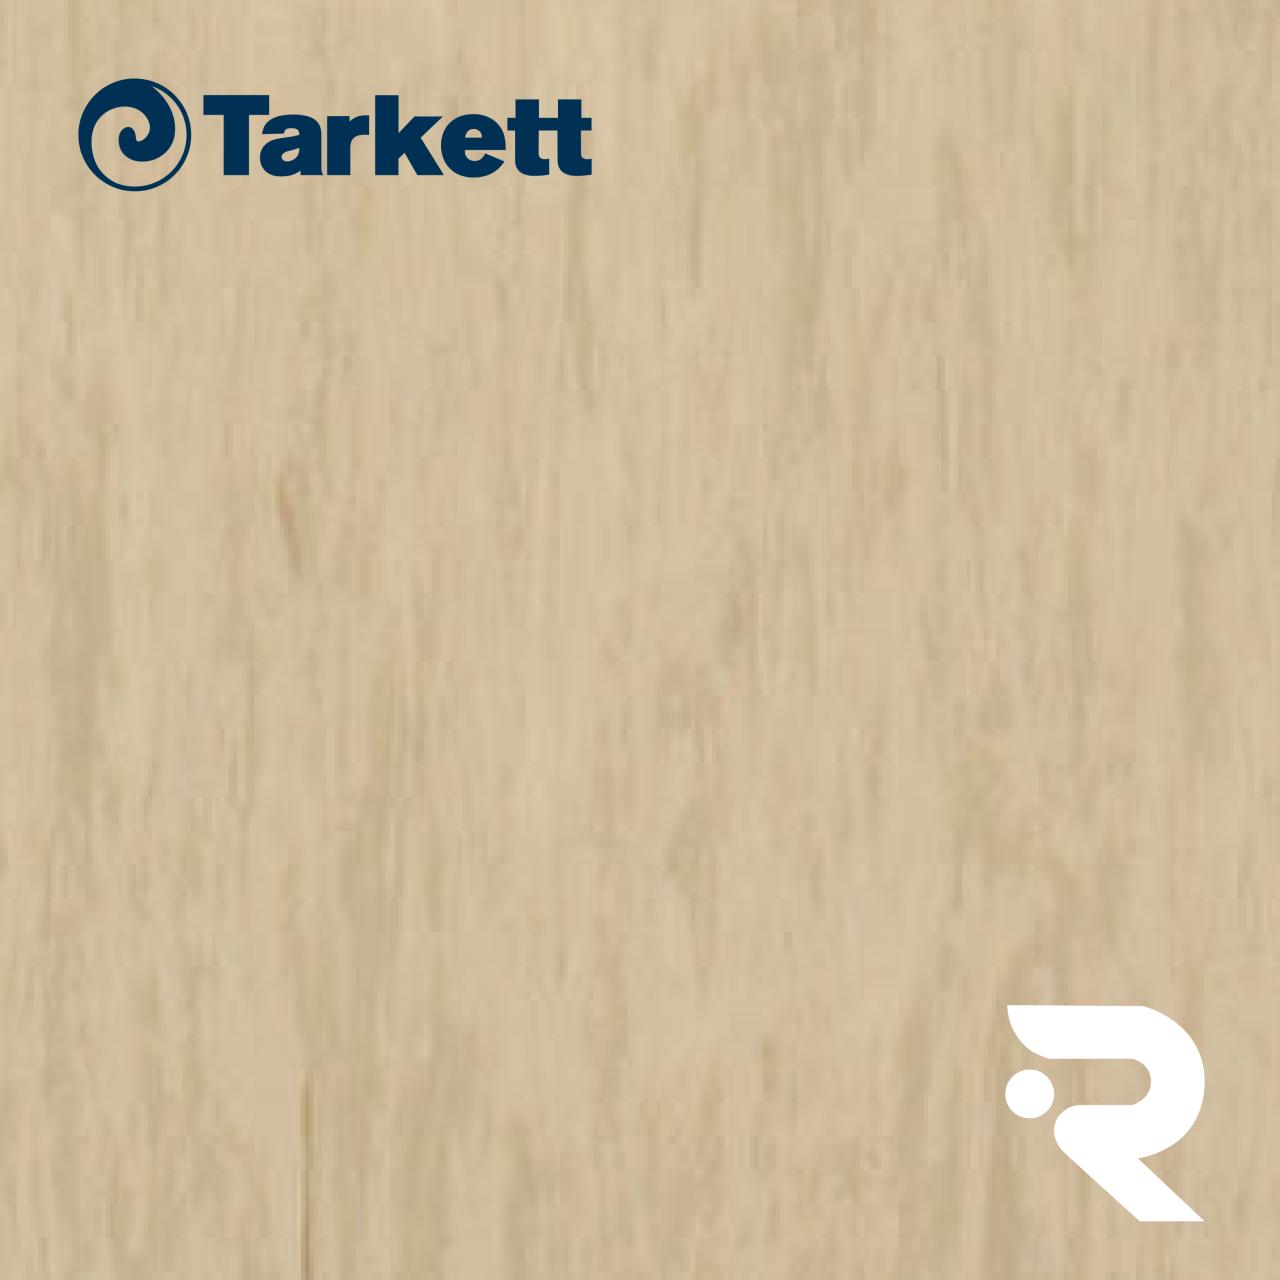 🏫 Гомогенный линолеум Tarkett | Standard LIGHT YELLOW BEIGE 0483 | Standard Plus 2.0 mm | 610 х 610 мм